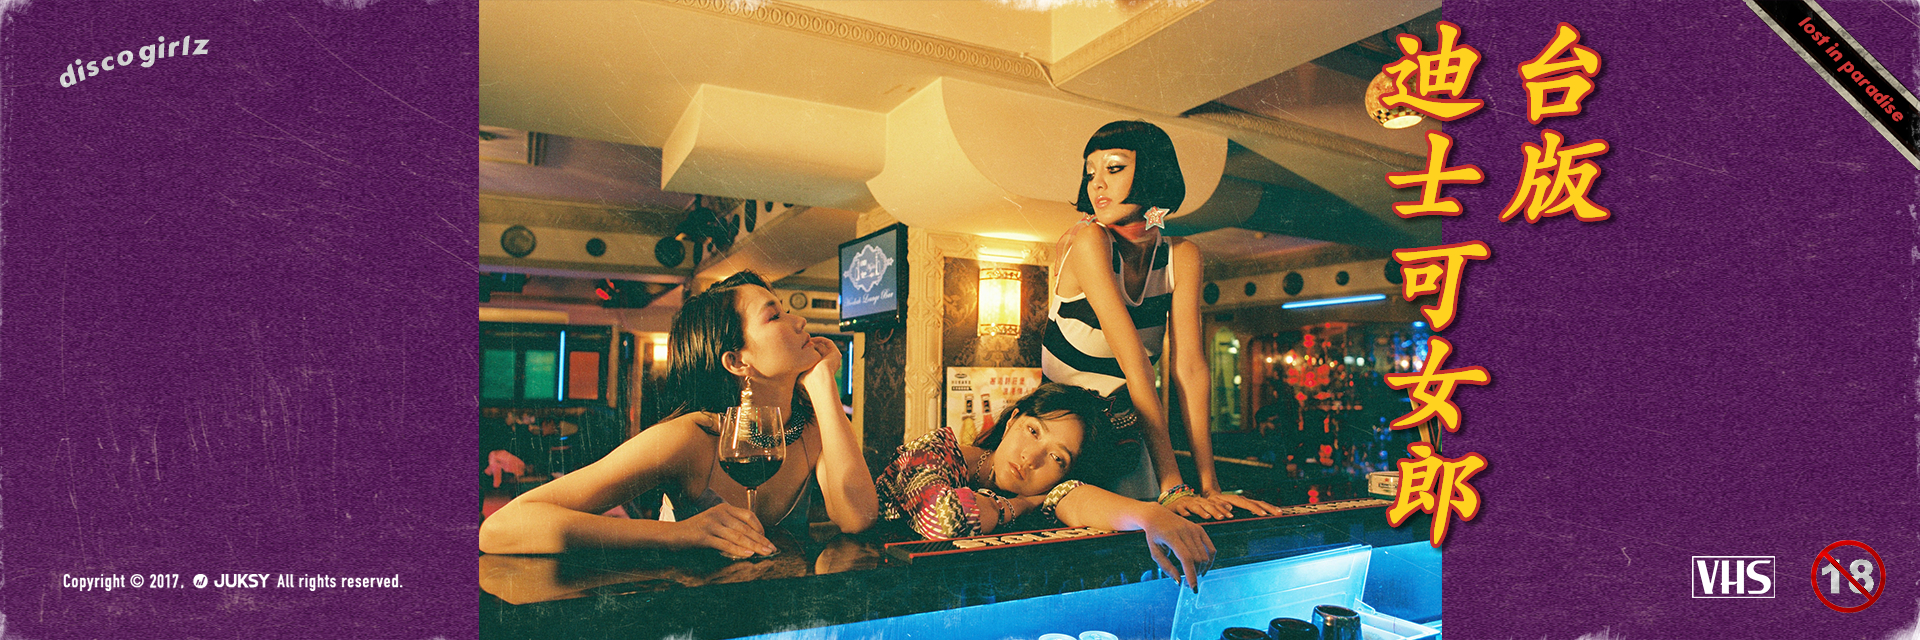 【Hot Issue Vol.2:台版迪士可】週一入場男士免費!Disco 女郎大舞廳復刻登場!